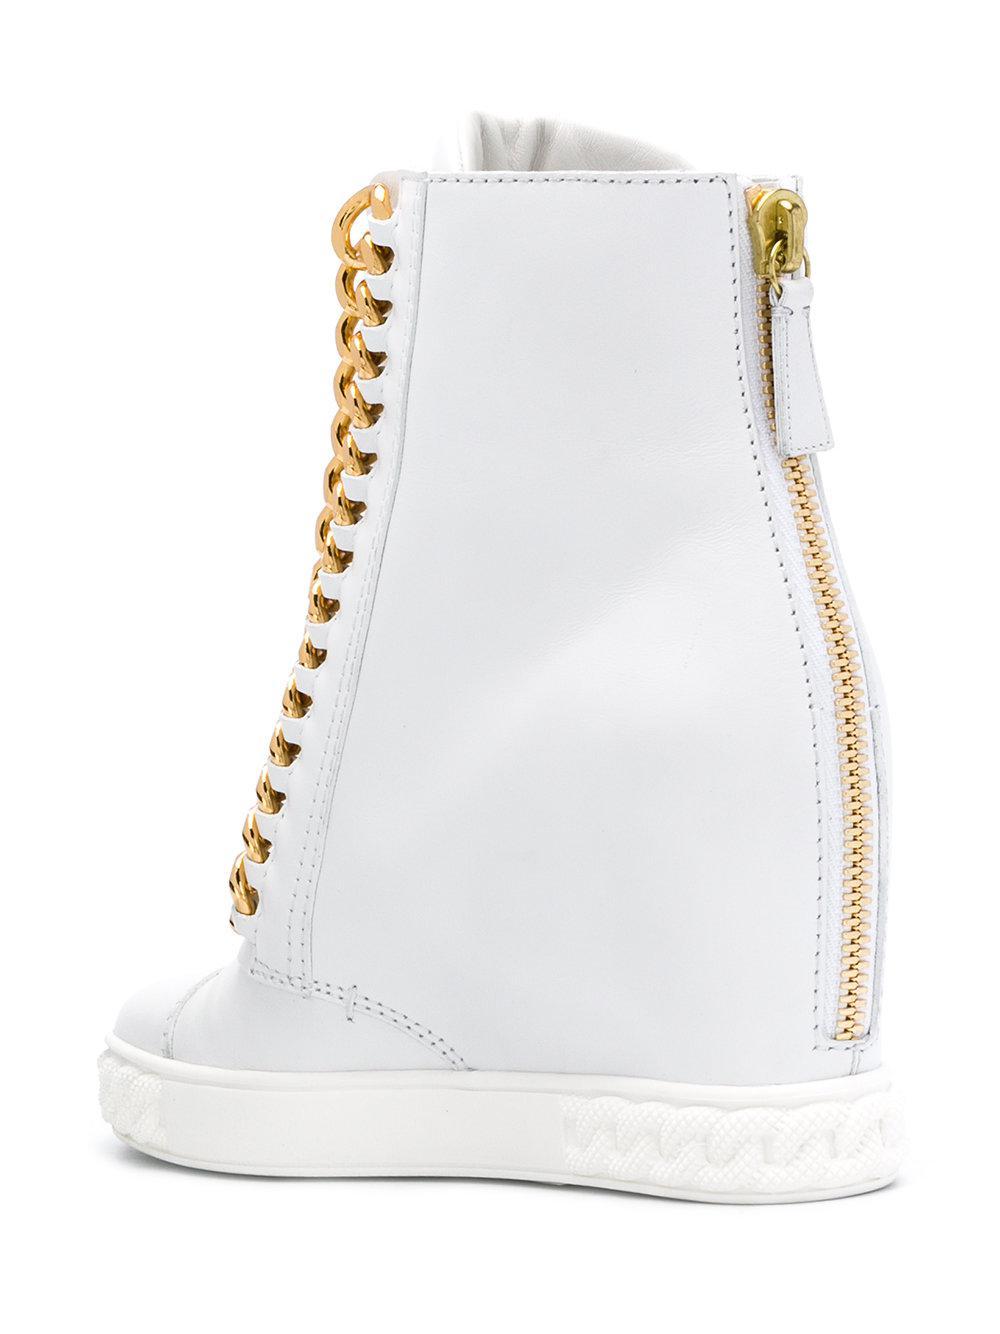 In White Chain Hi Top Sneakers Lyst Trim Casadei Yq1500